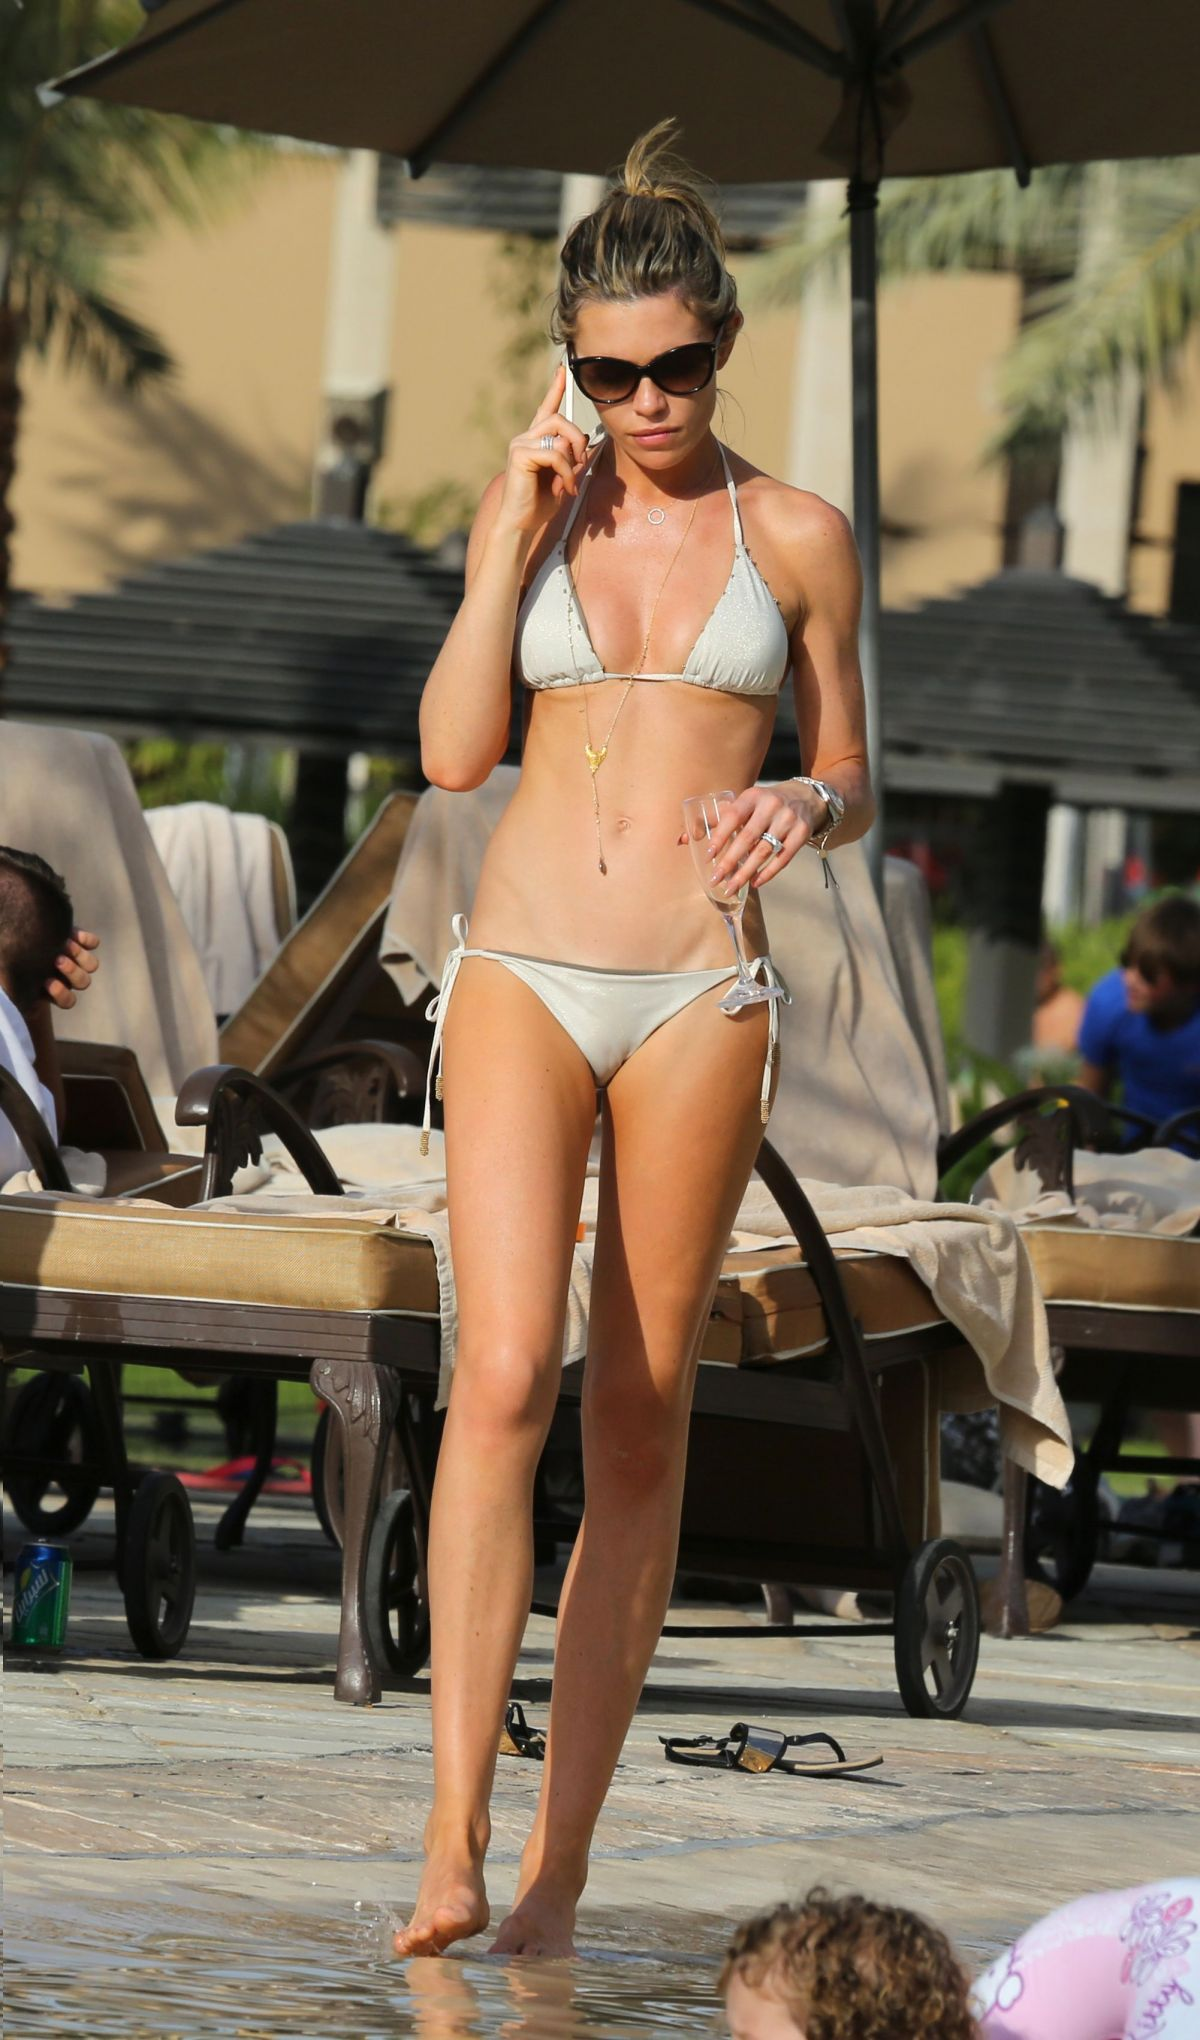 Fall Out Boy Mac Wallpaper Abigail Abbey Clancy In A Tiny Bikini At A Pool In Dubai